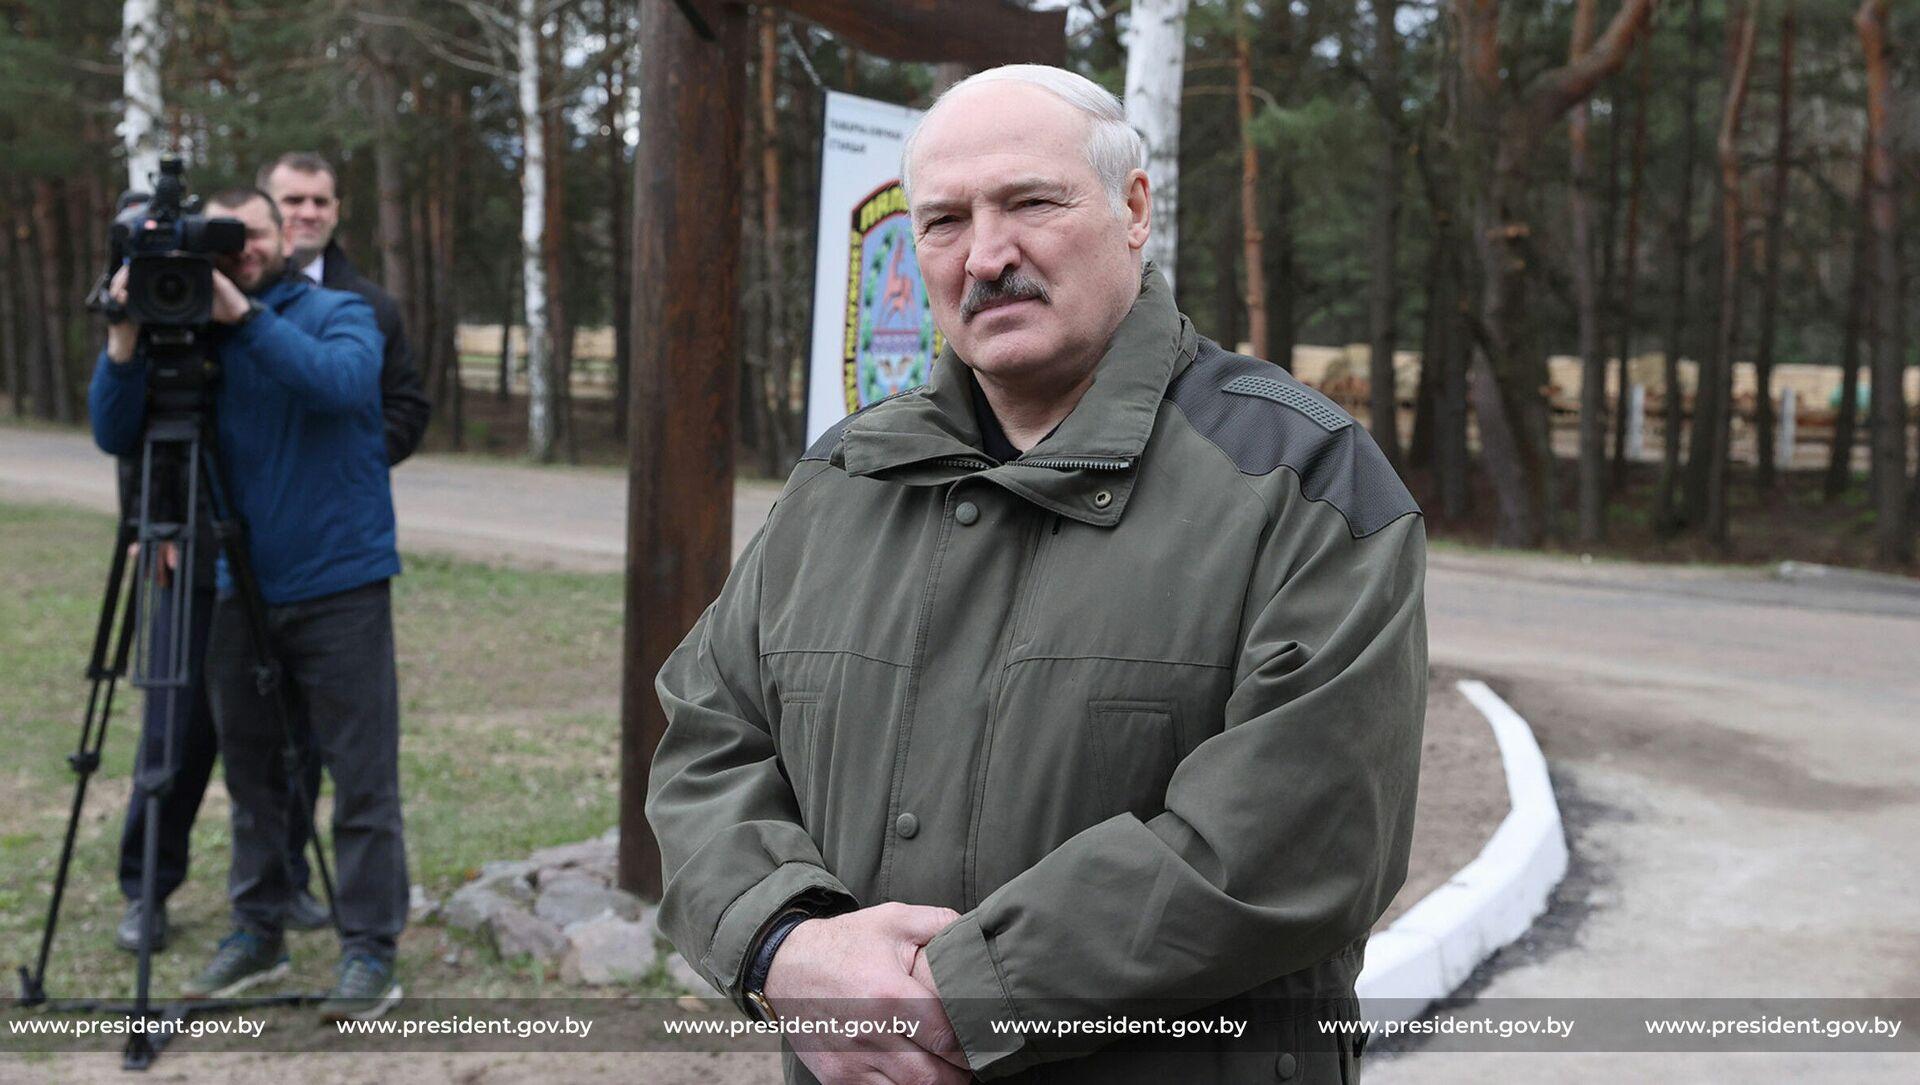 Александр Лукашенко в Наровлянском районе - Sputnik Беларусь, 1920, 01.05.2021